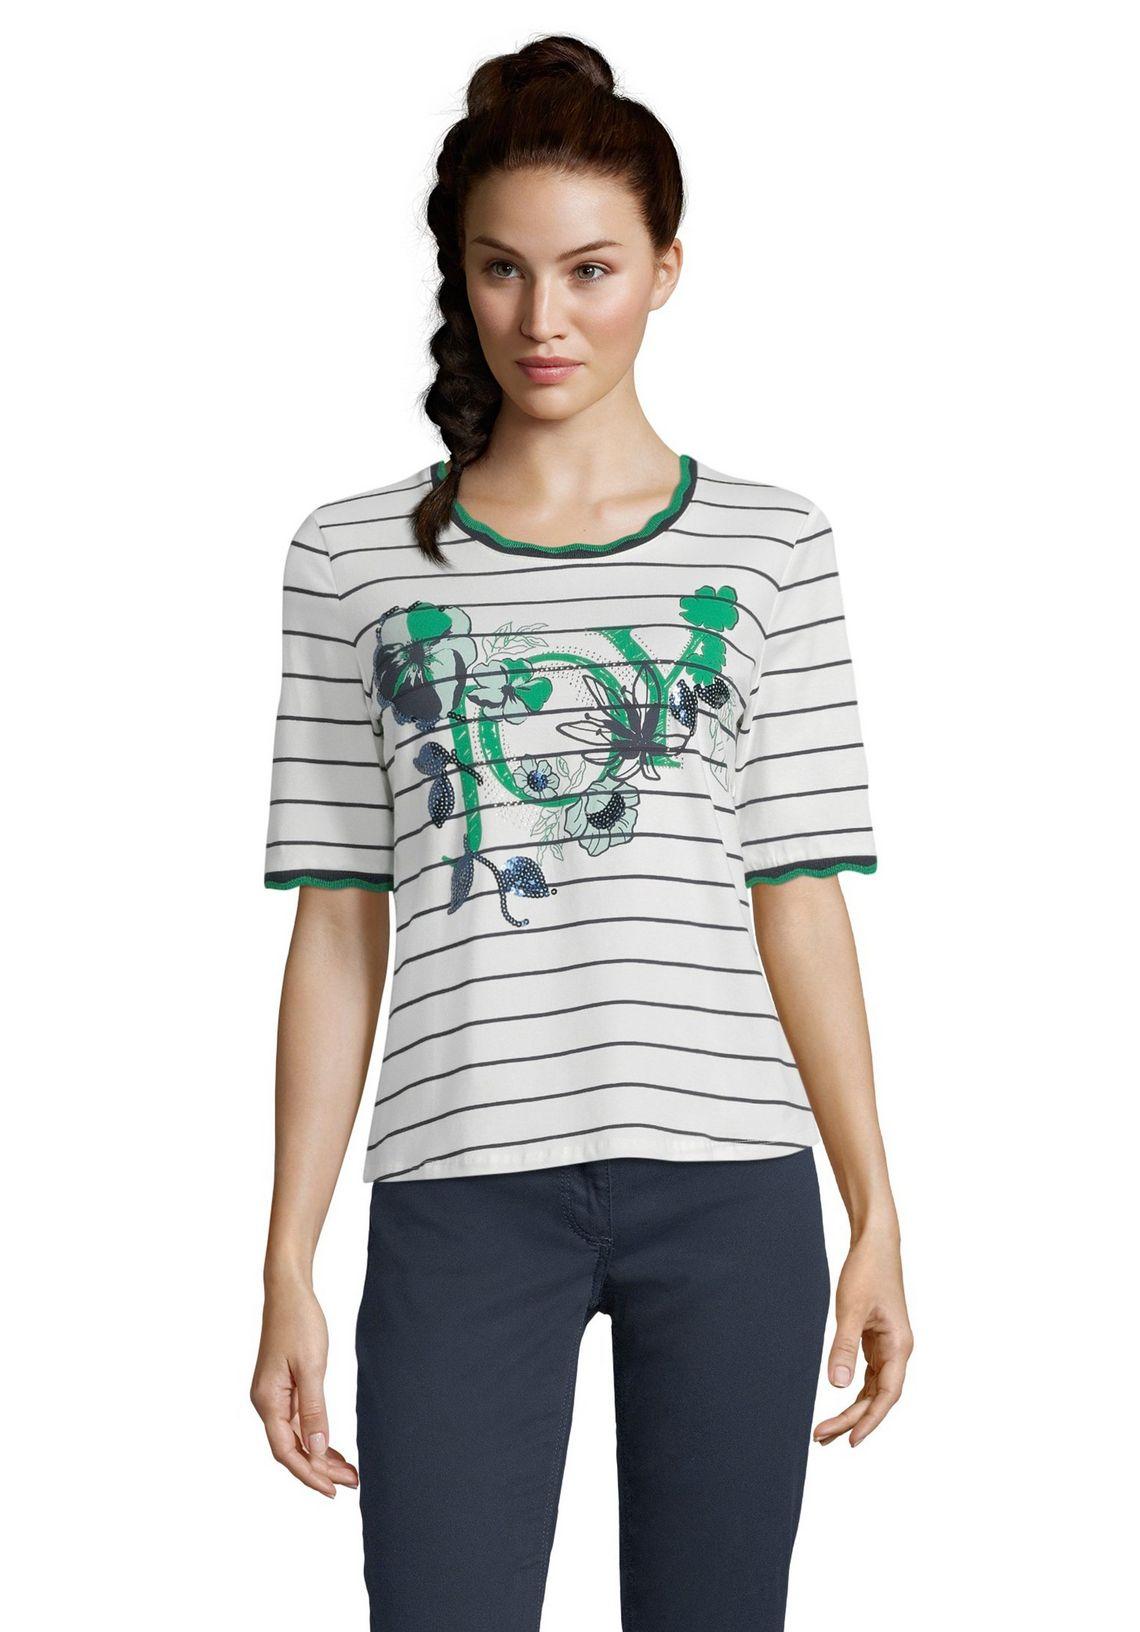 Betty Barclay Gestreept Shirt In De Online Shop Cream/green - Wit ryVuFy6H